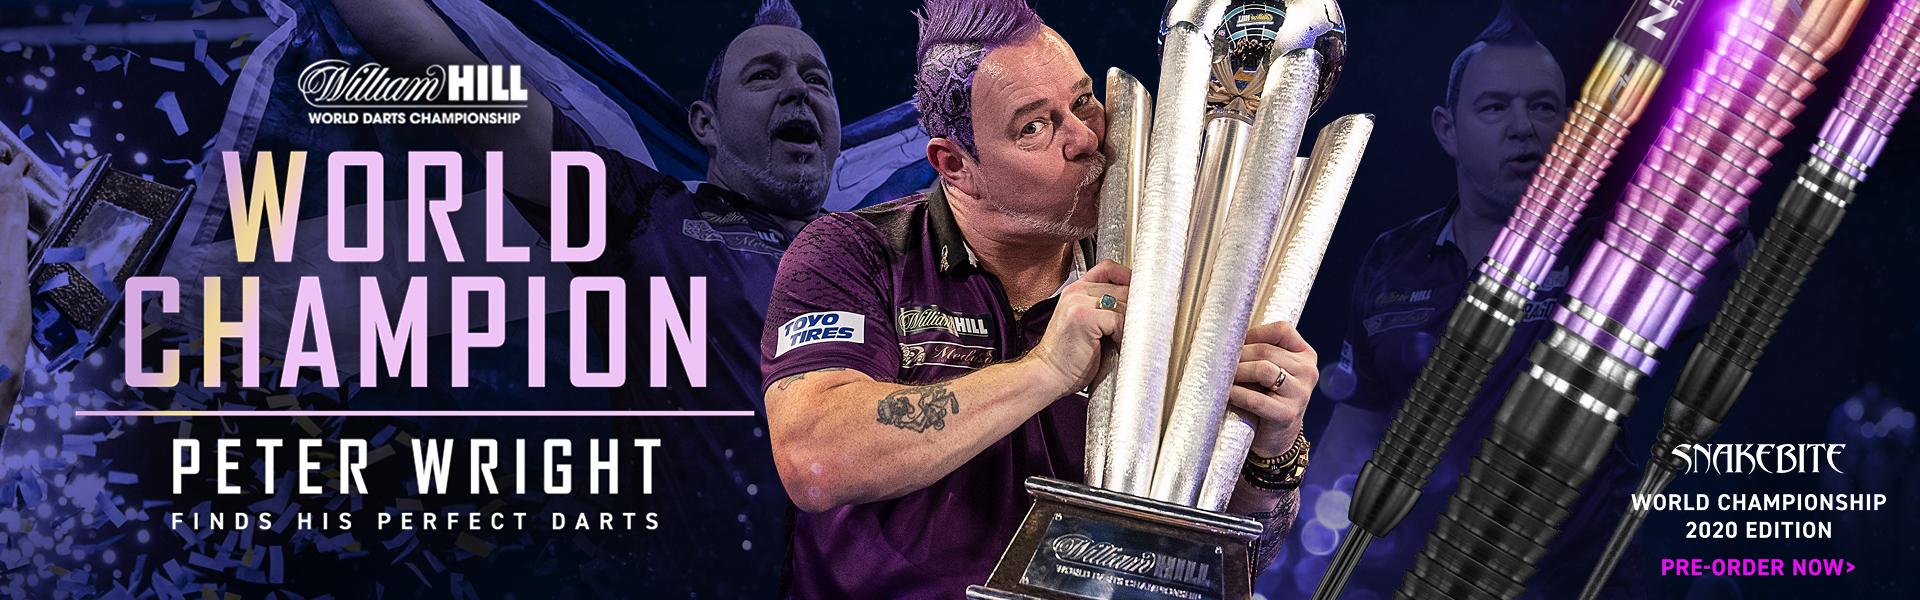 Peter Wright World Champion 2020